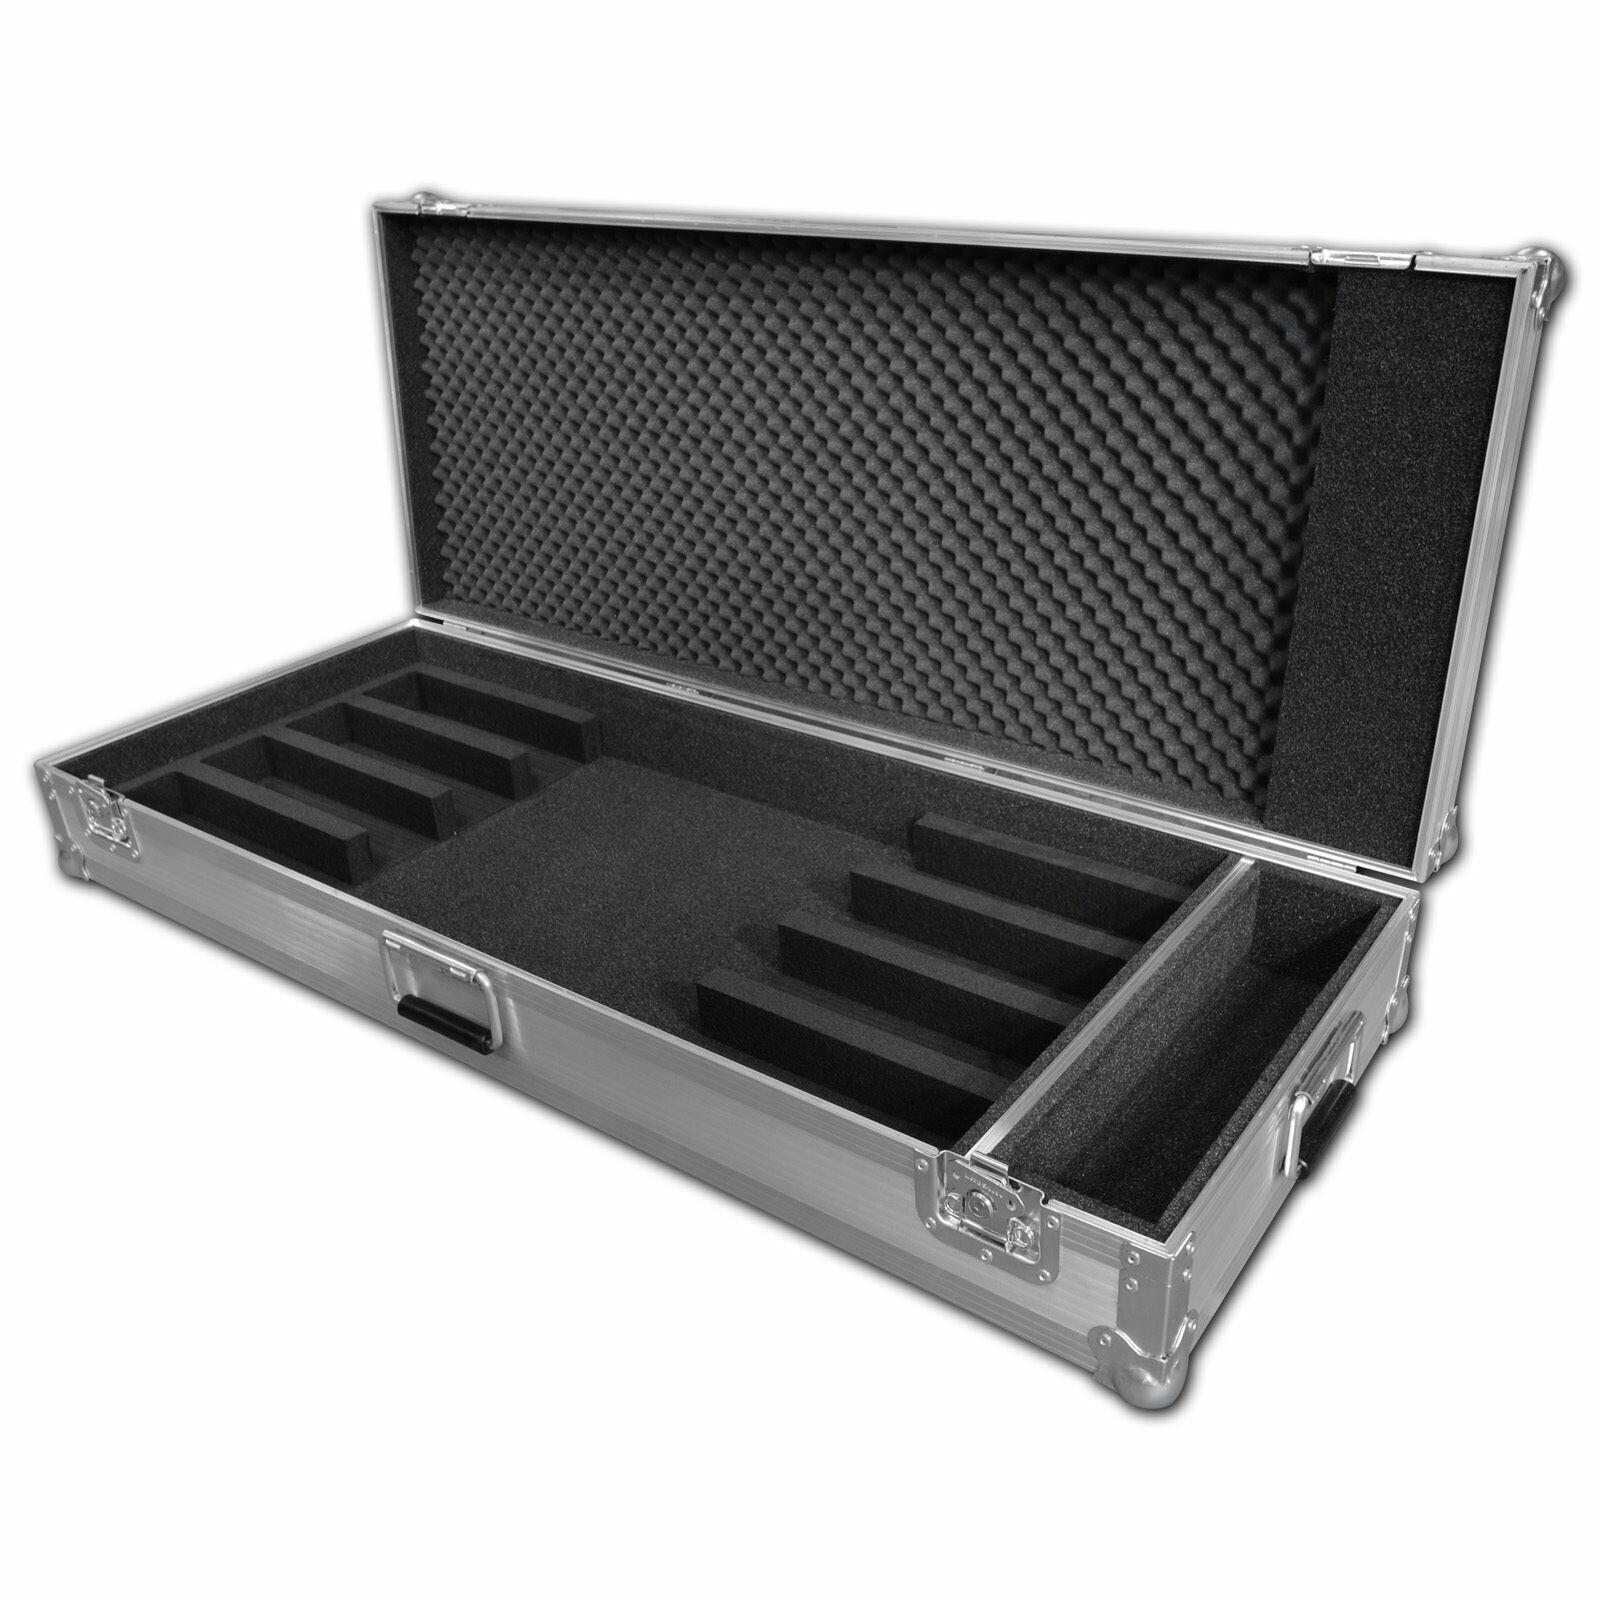 LED Batten Flight Case To fit 4 Battens for American DJ Ultra Bar 6